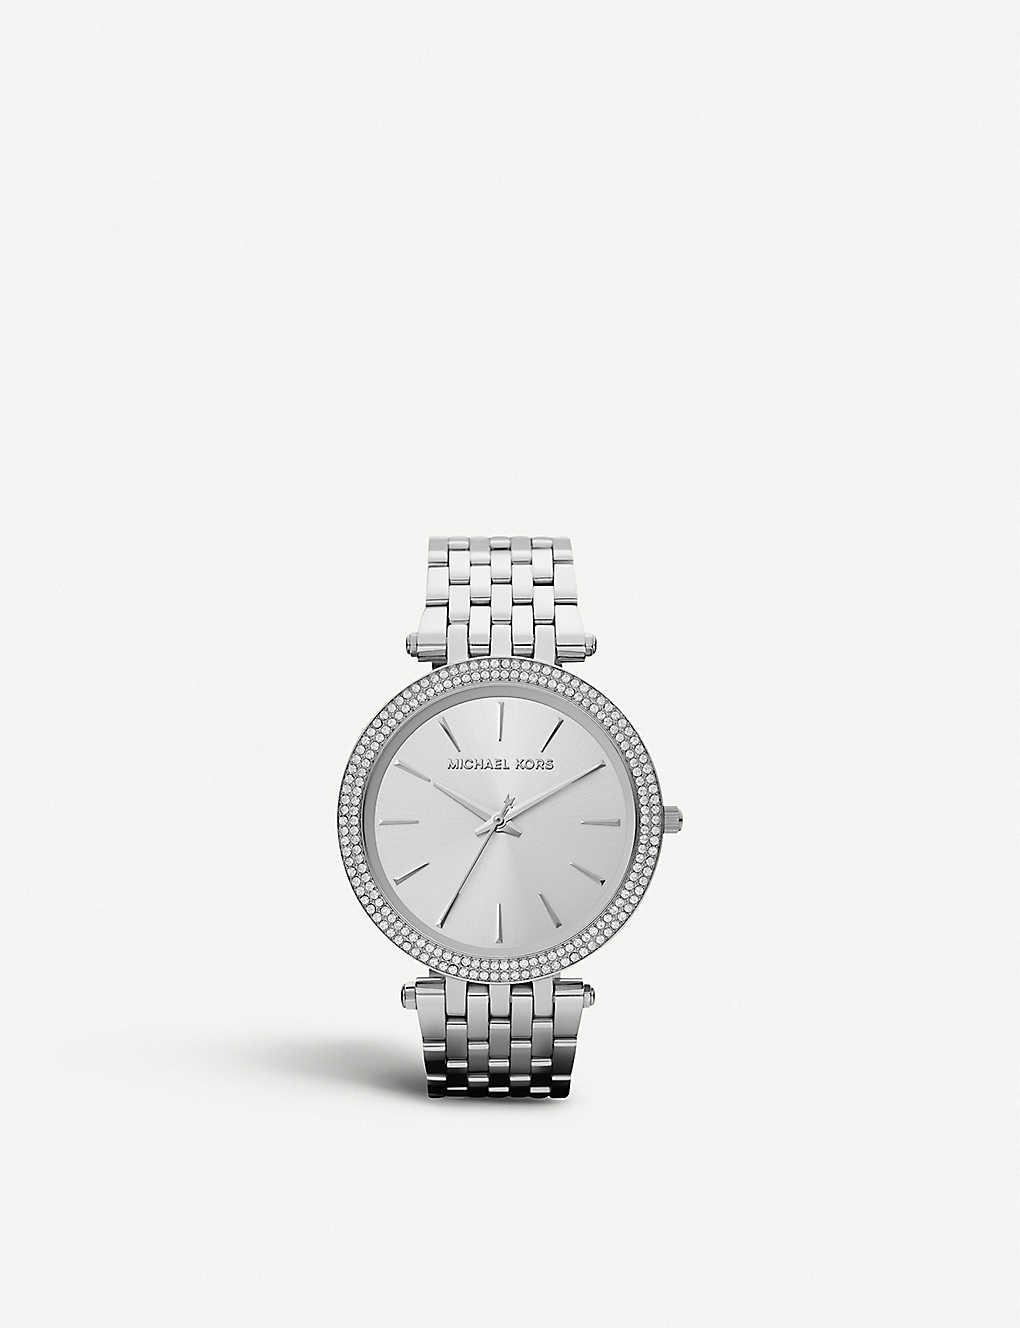 372fcb295bc7 MICHAEL KORS - MK3190 Darci stainless steel bracelet watch ...